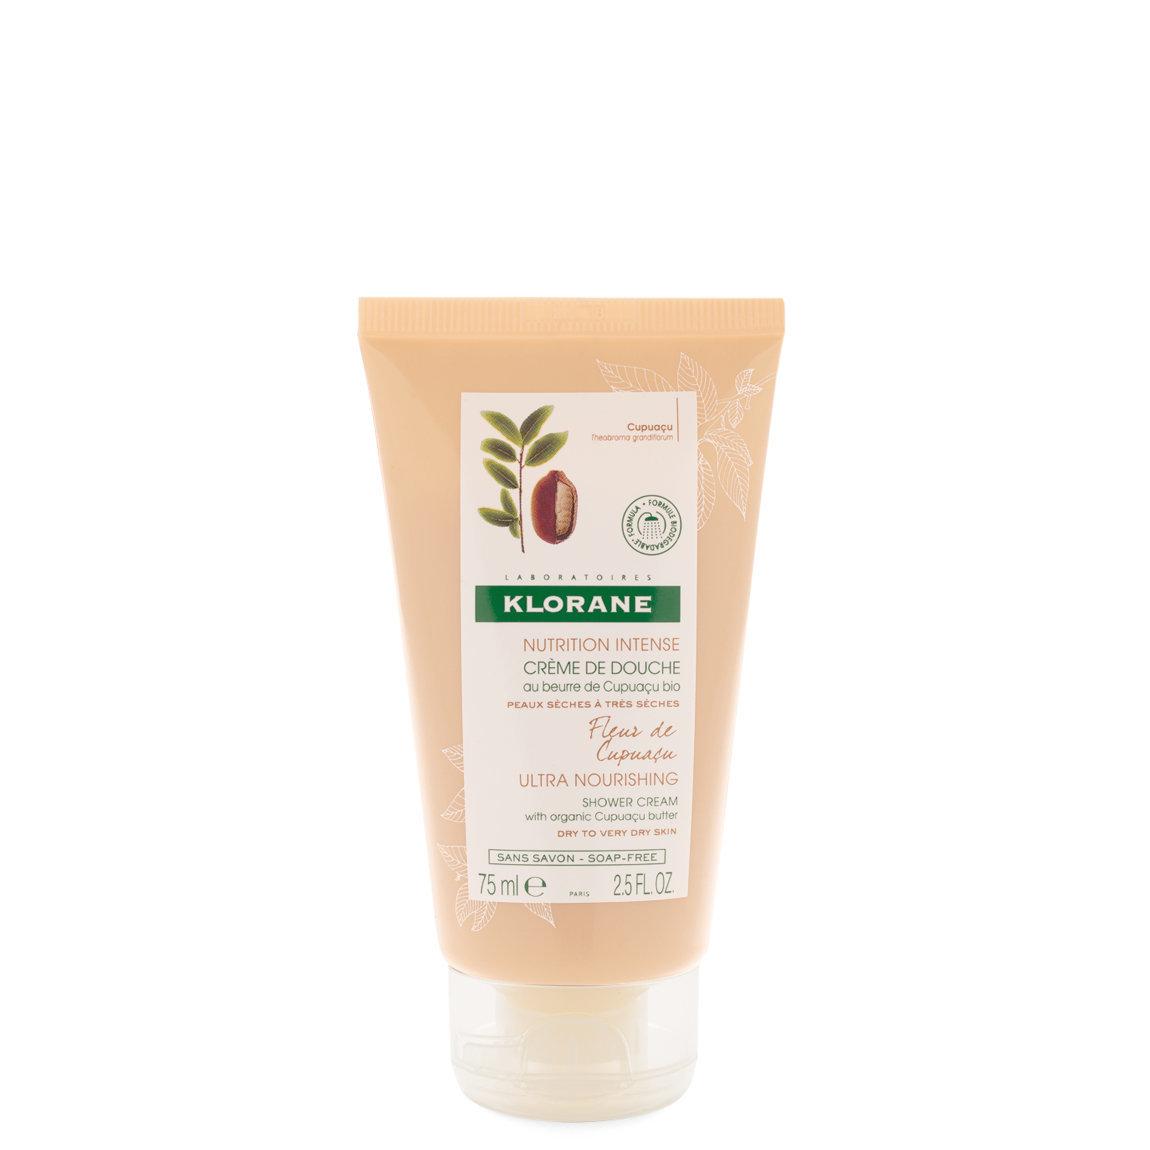 Klorane Cupuaçu Flower Shower Cream with Cupuaçu Butter 2.5 fl oz alternative view 1 - product swatch.